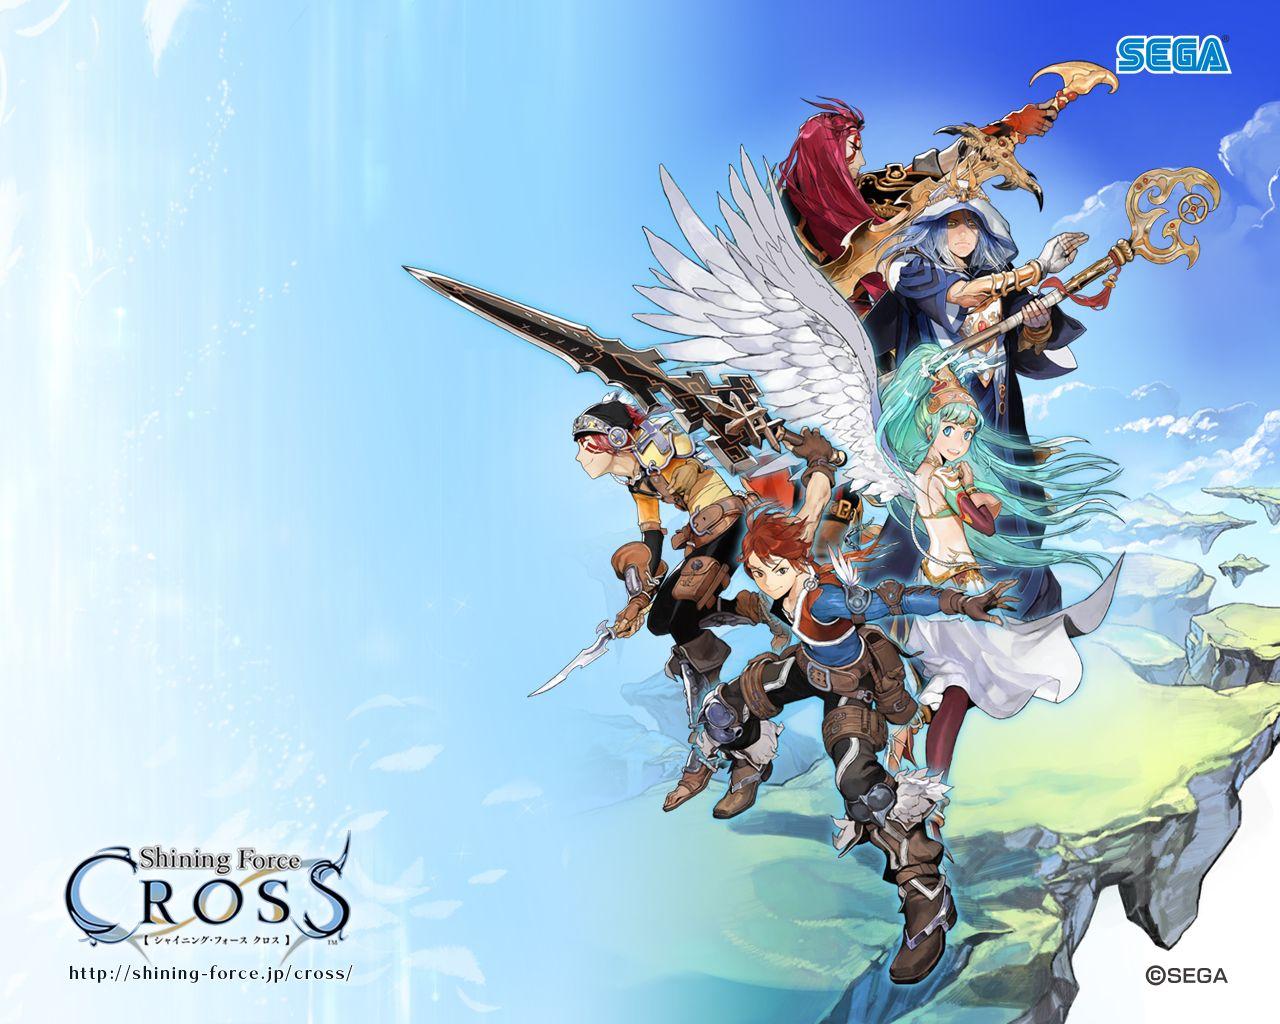 Shining Force Cross 集合絵, 絵, 廣岡